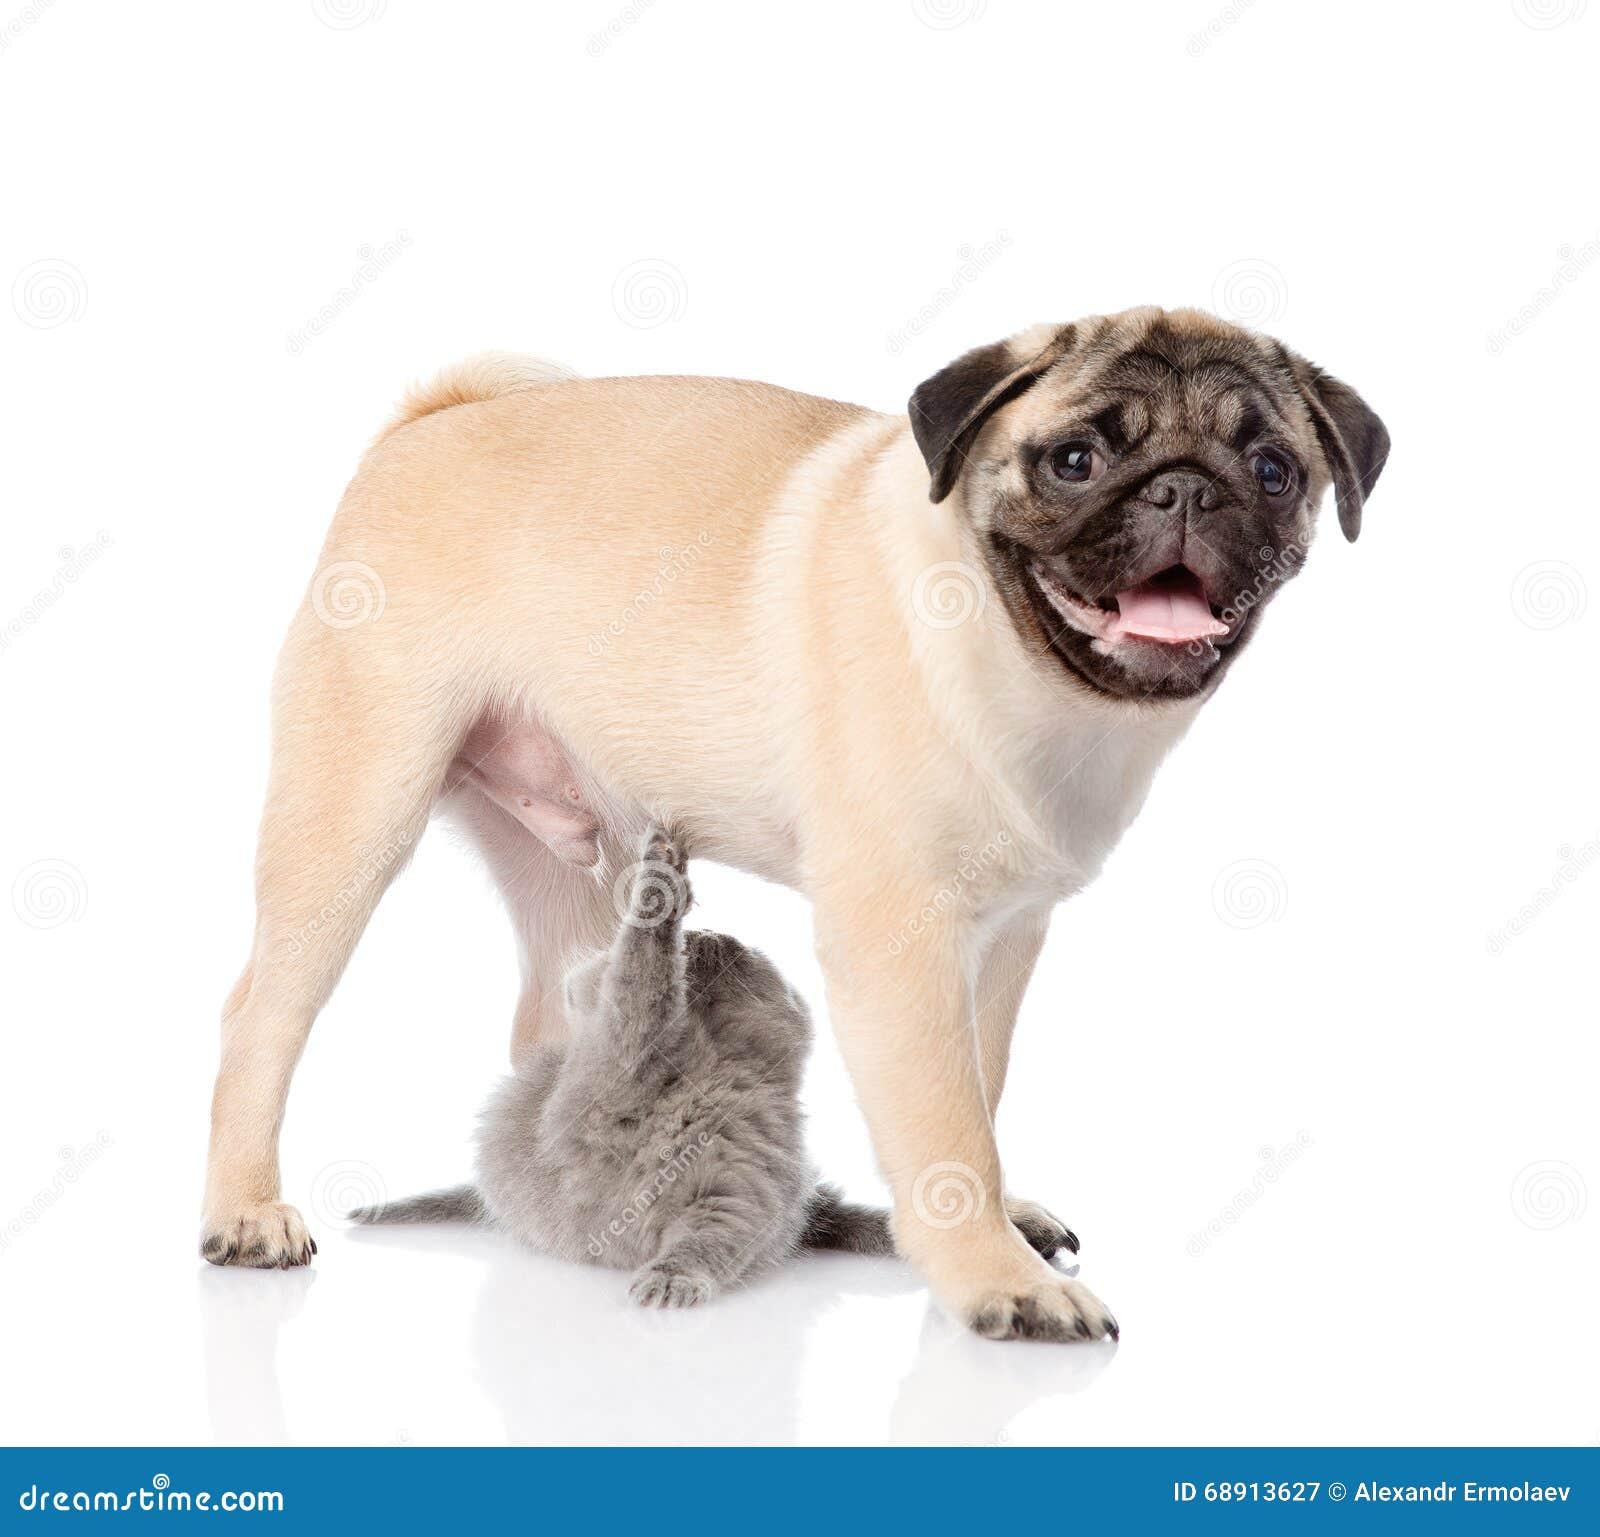 Playful Scottish Cat With Pug Puppy Isolated On White Background